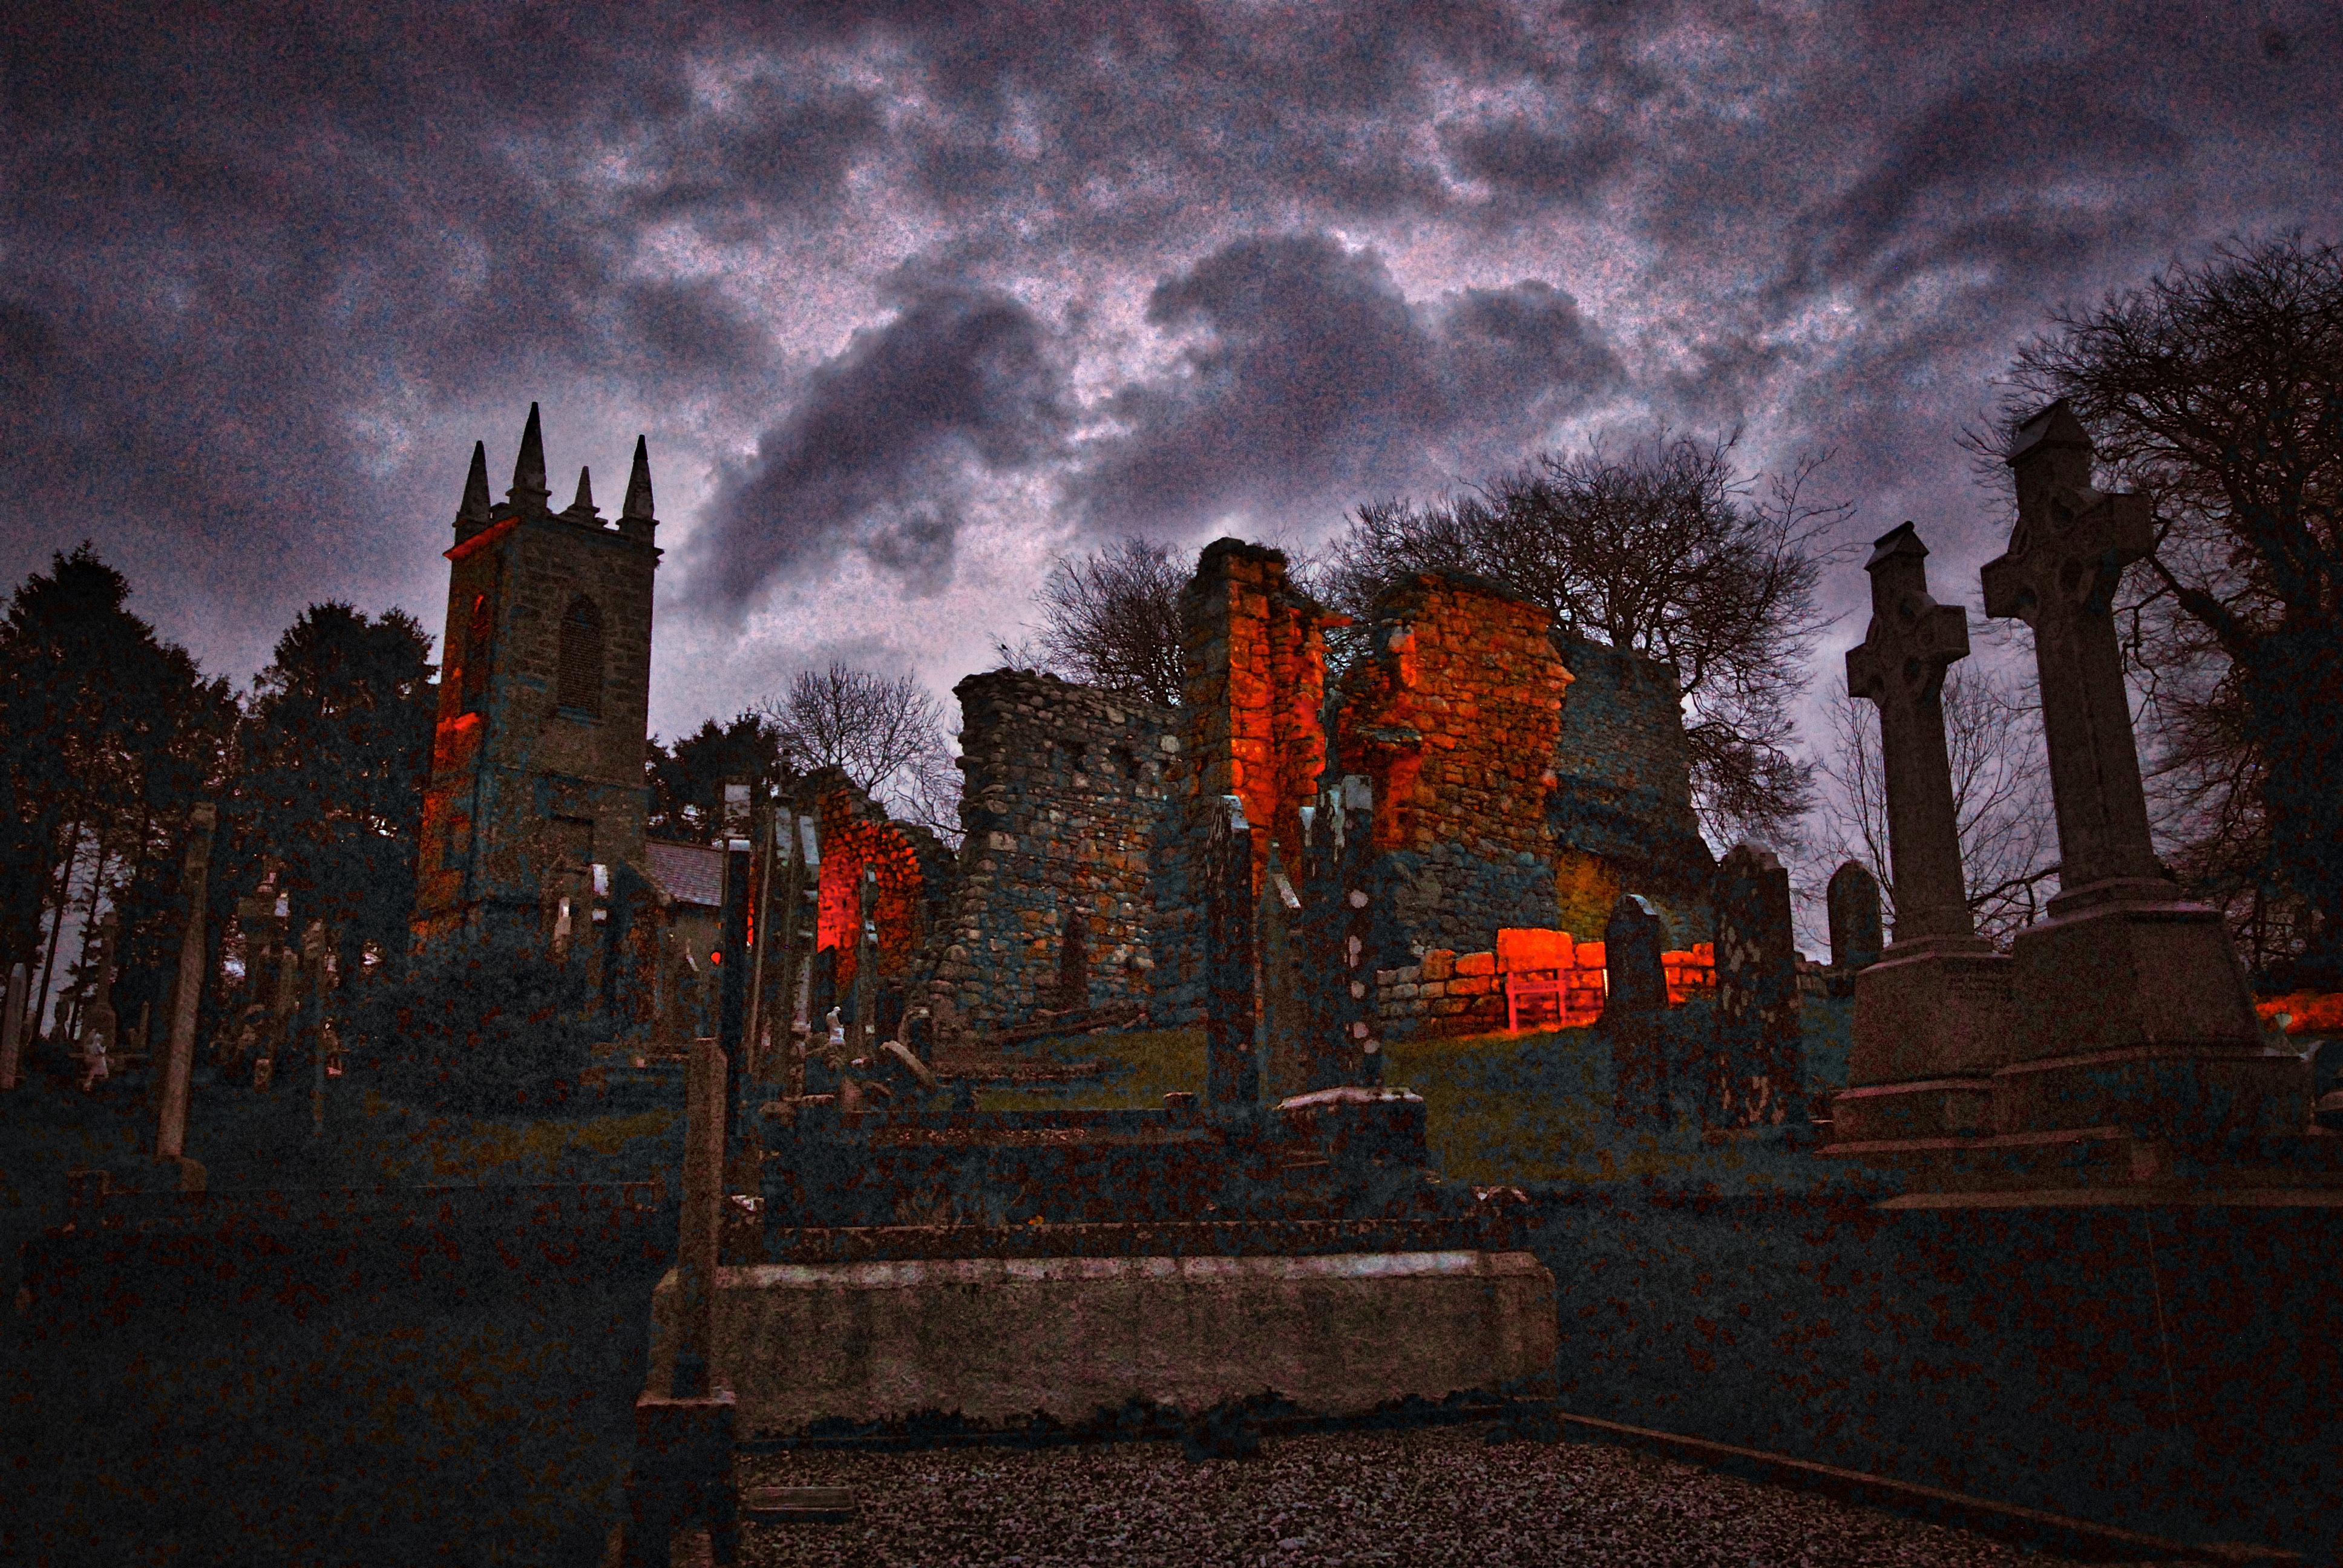 18-2-st-mullins-monastic-village-county-carlow